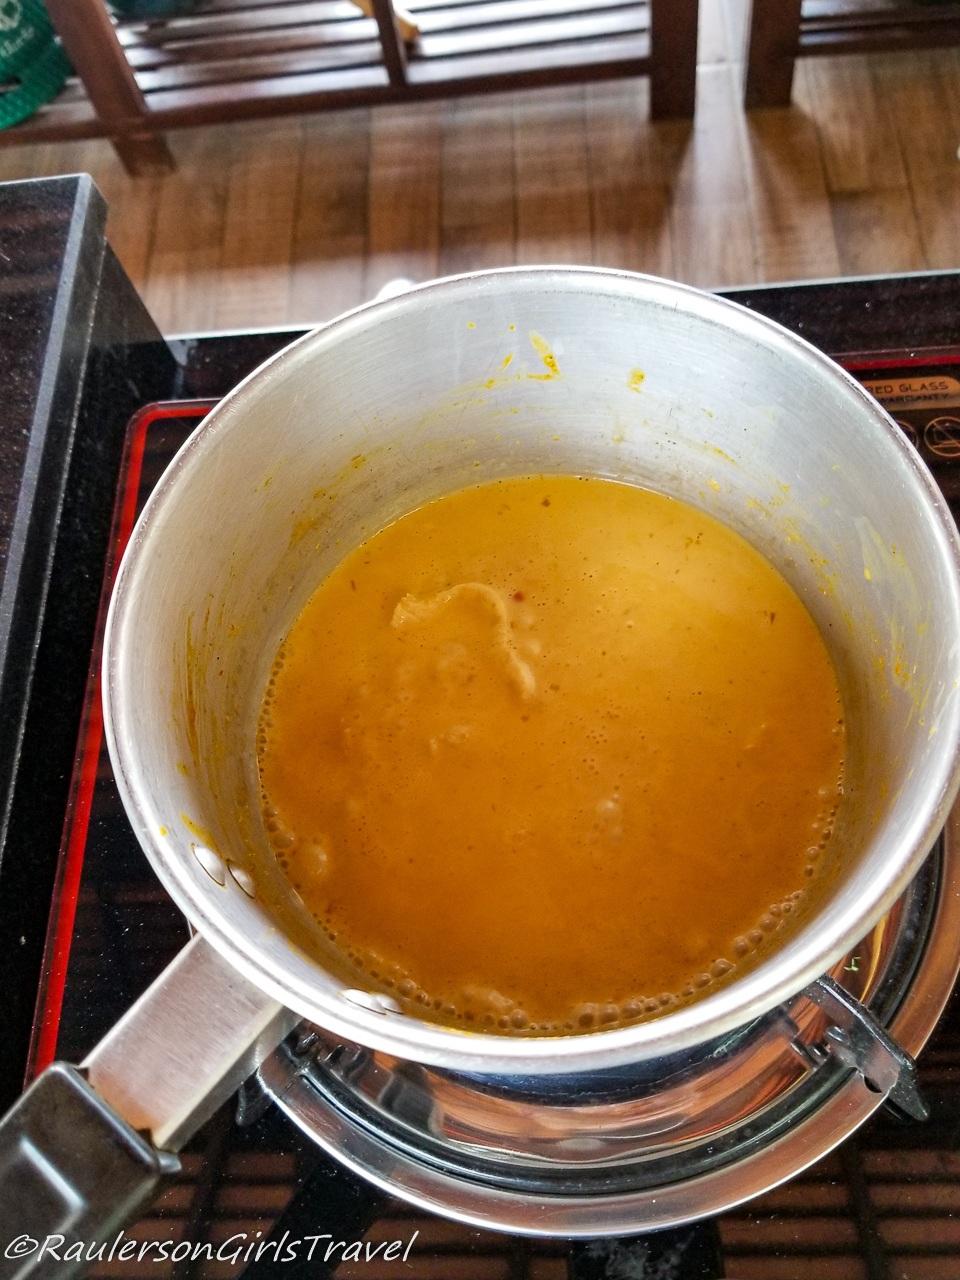 Adding the Crispy Noodles to the Khao Soi